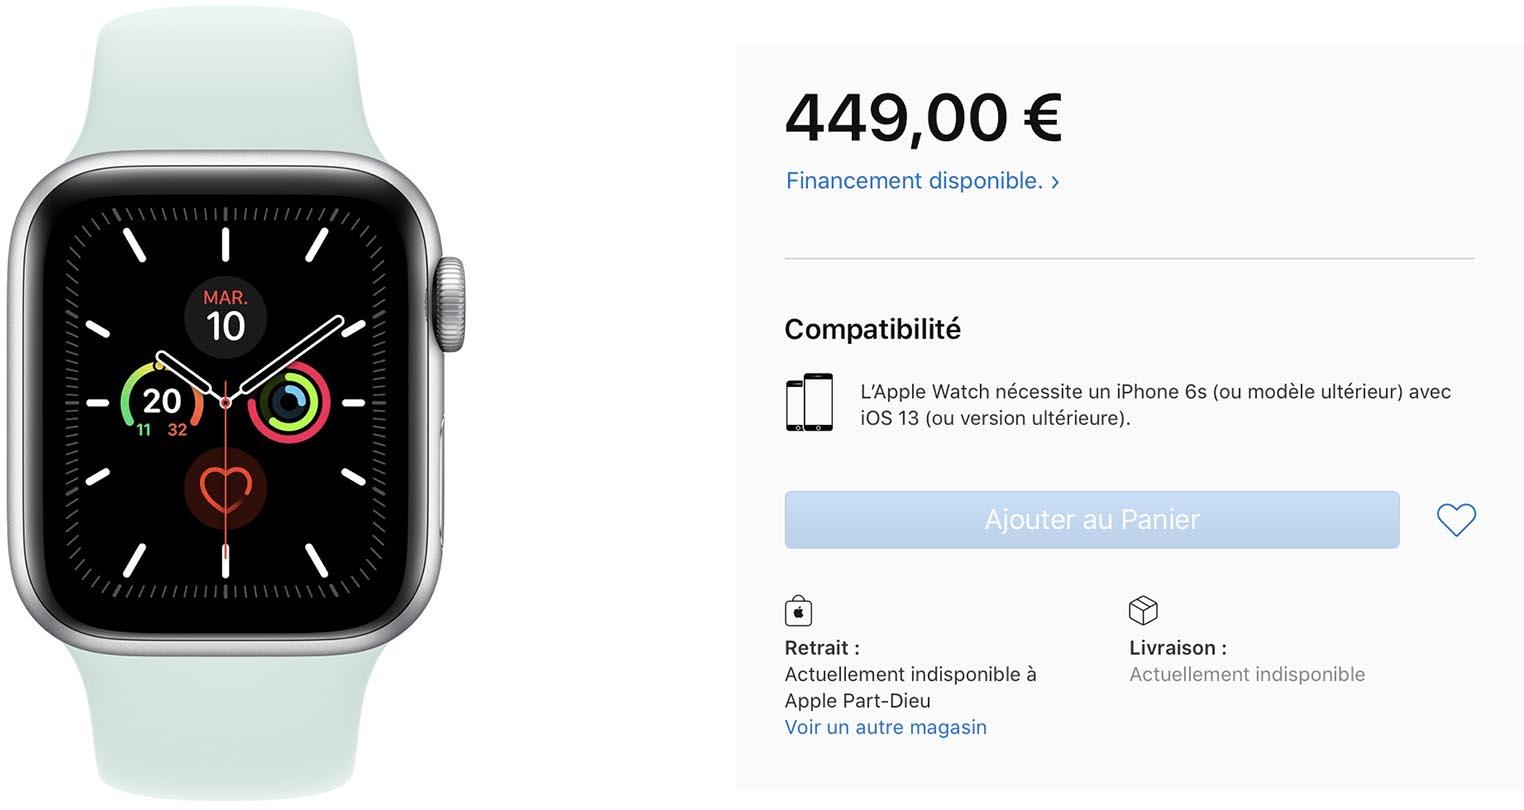 Apple Watch Series 5 actuellement indisponible